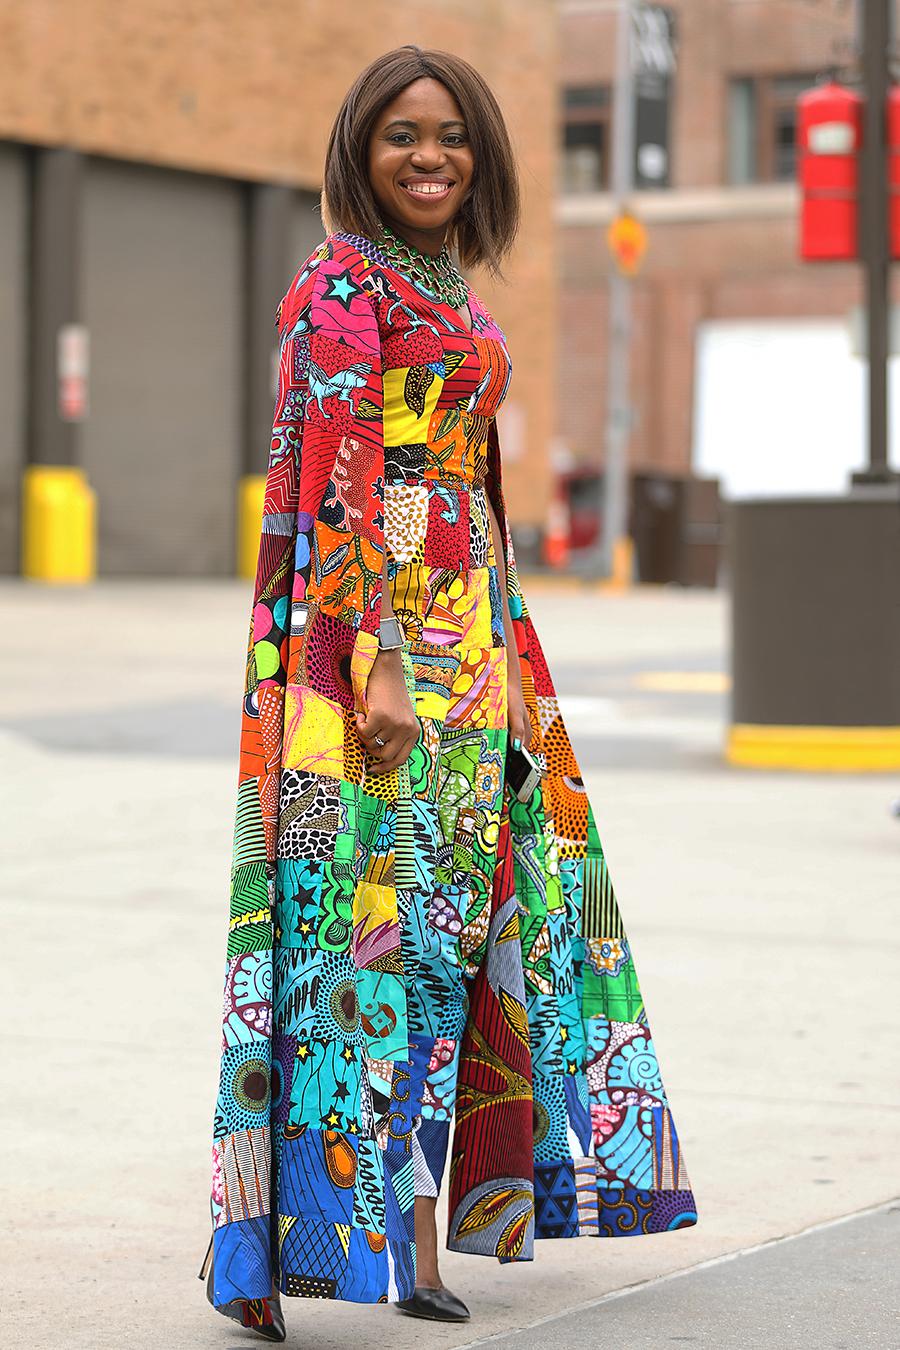 Cory_Fader_street_fashion_photography_NYC_Tony_Ward_Studio_colorful_print_dress